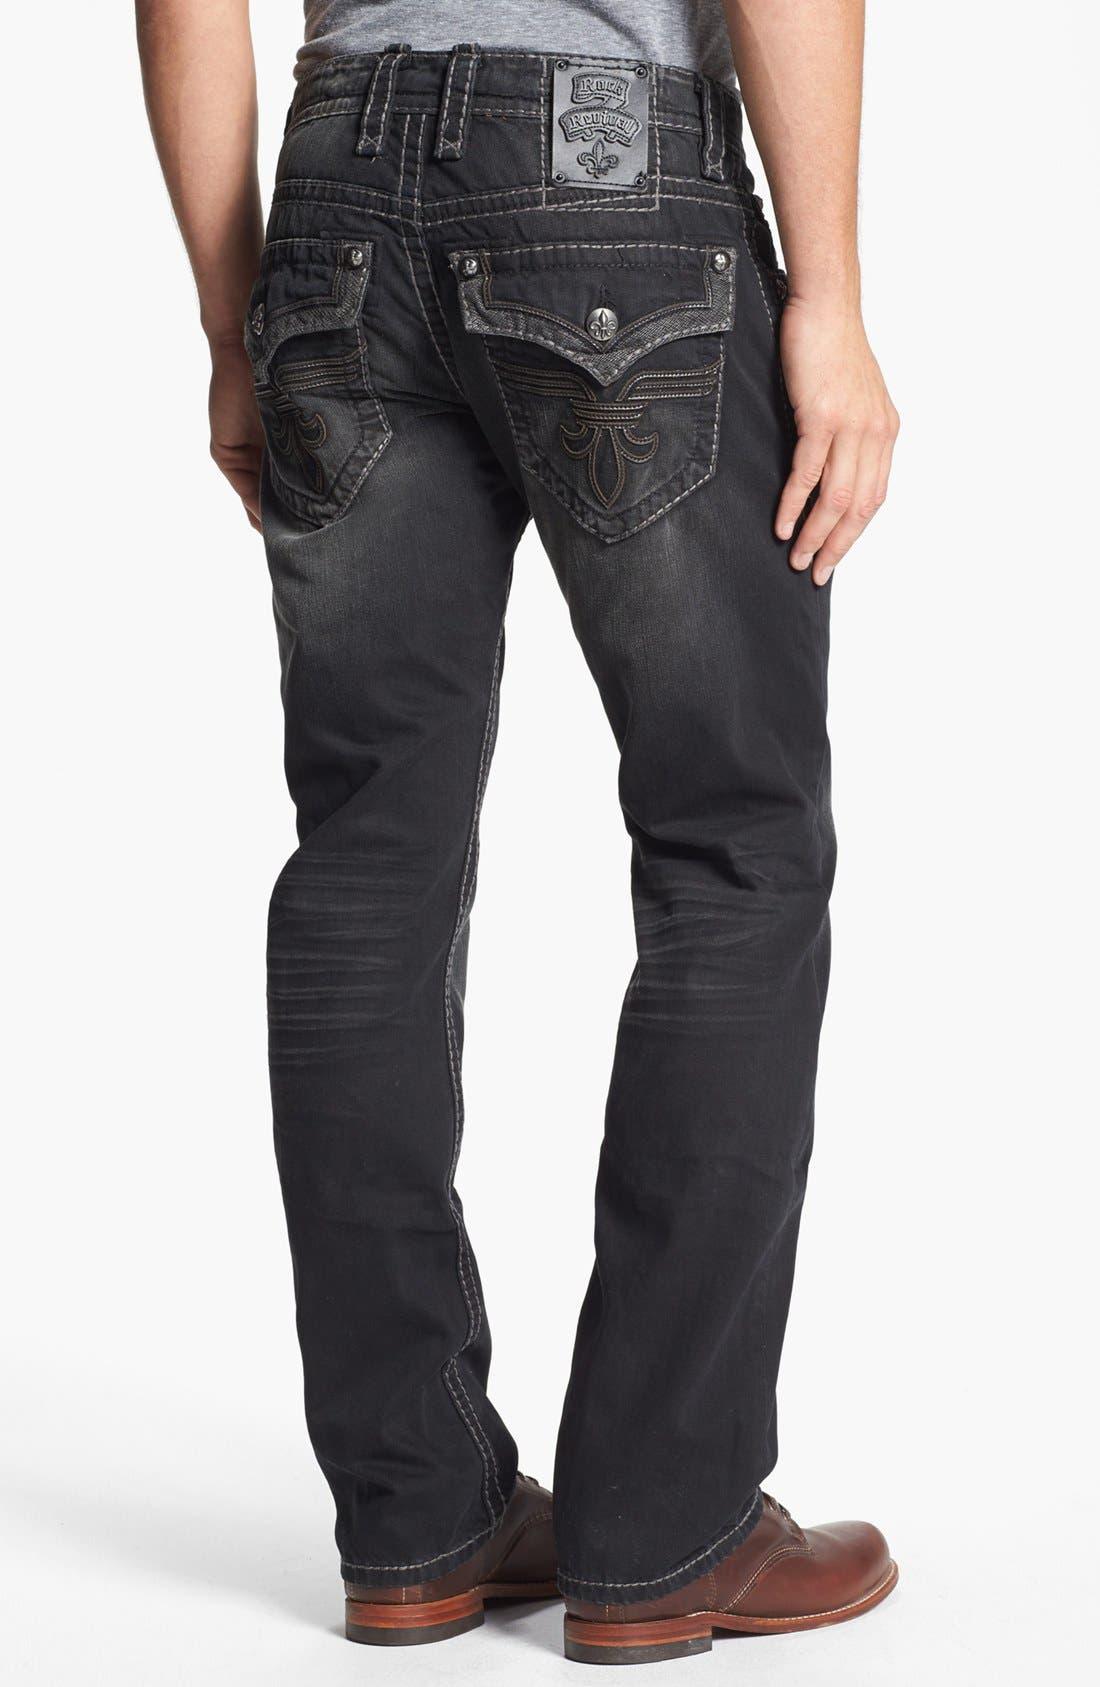 Alternate Image 1 Selected - Rock Revival 'Chopper' Straight Leg Jeans (Black)